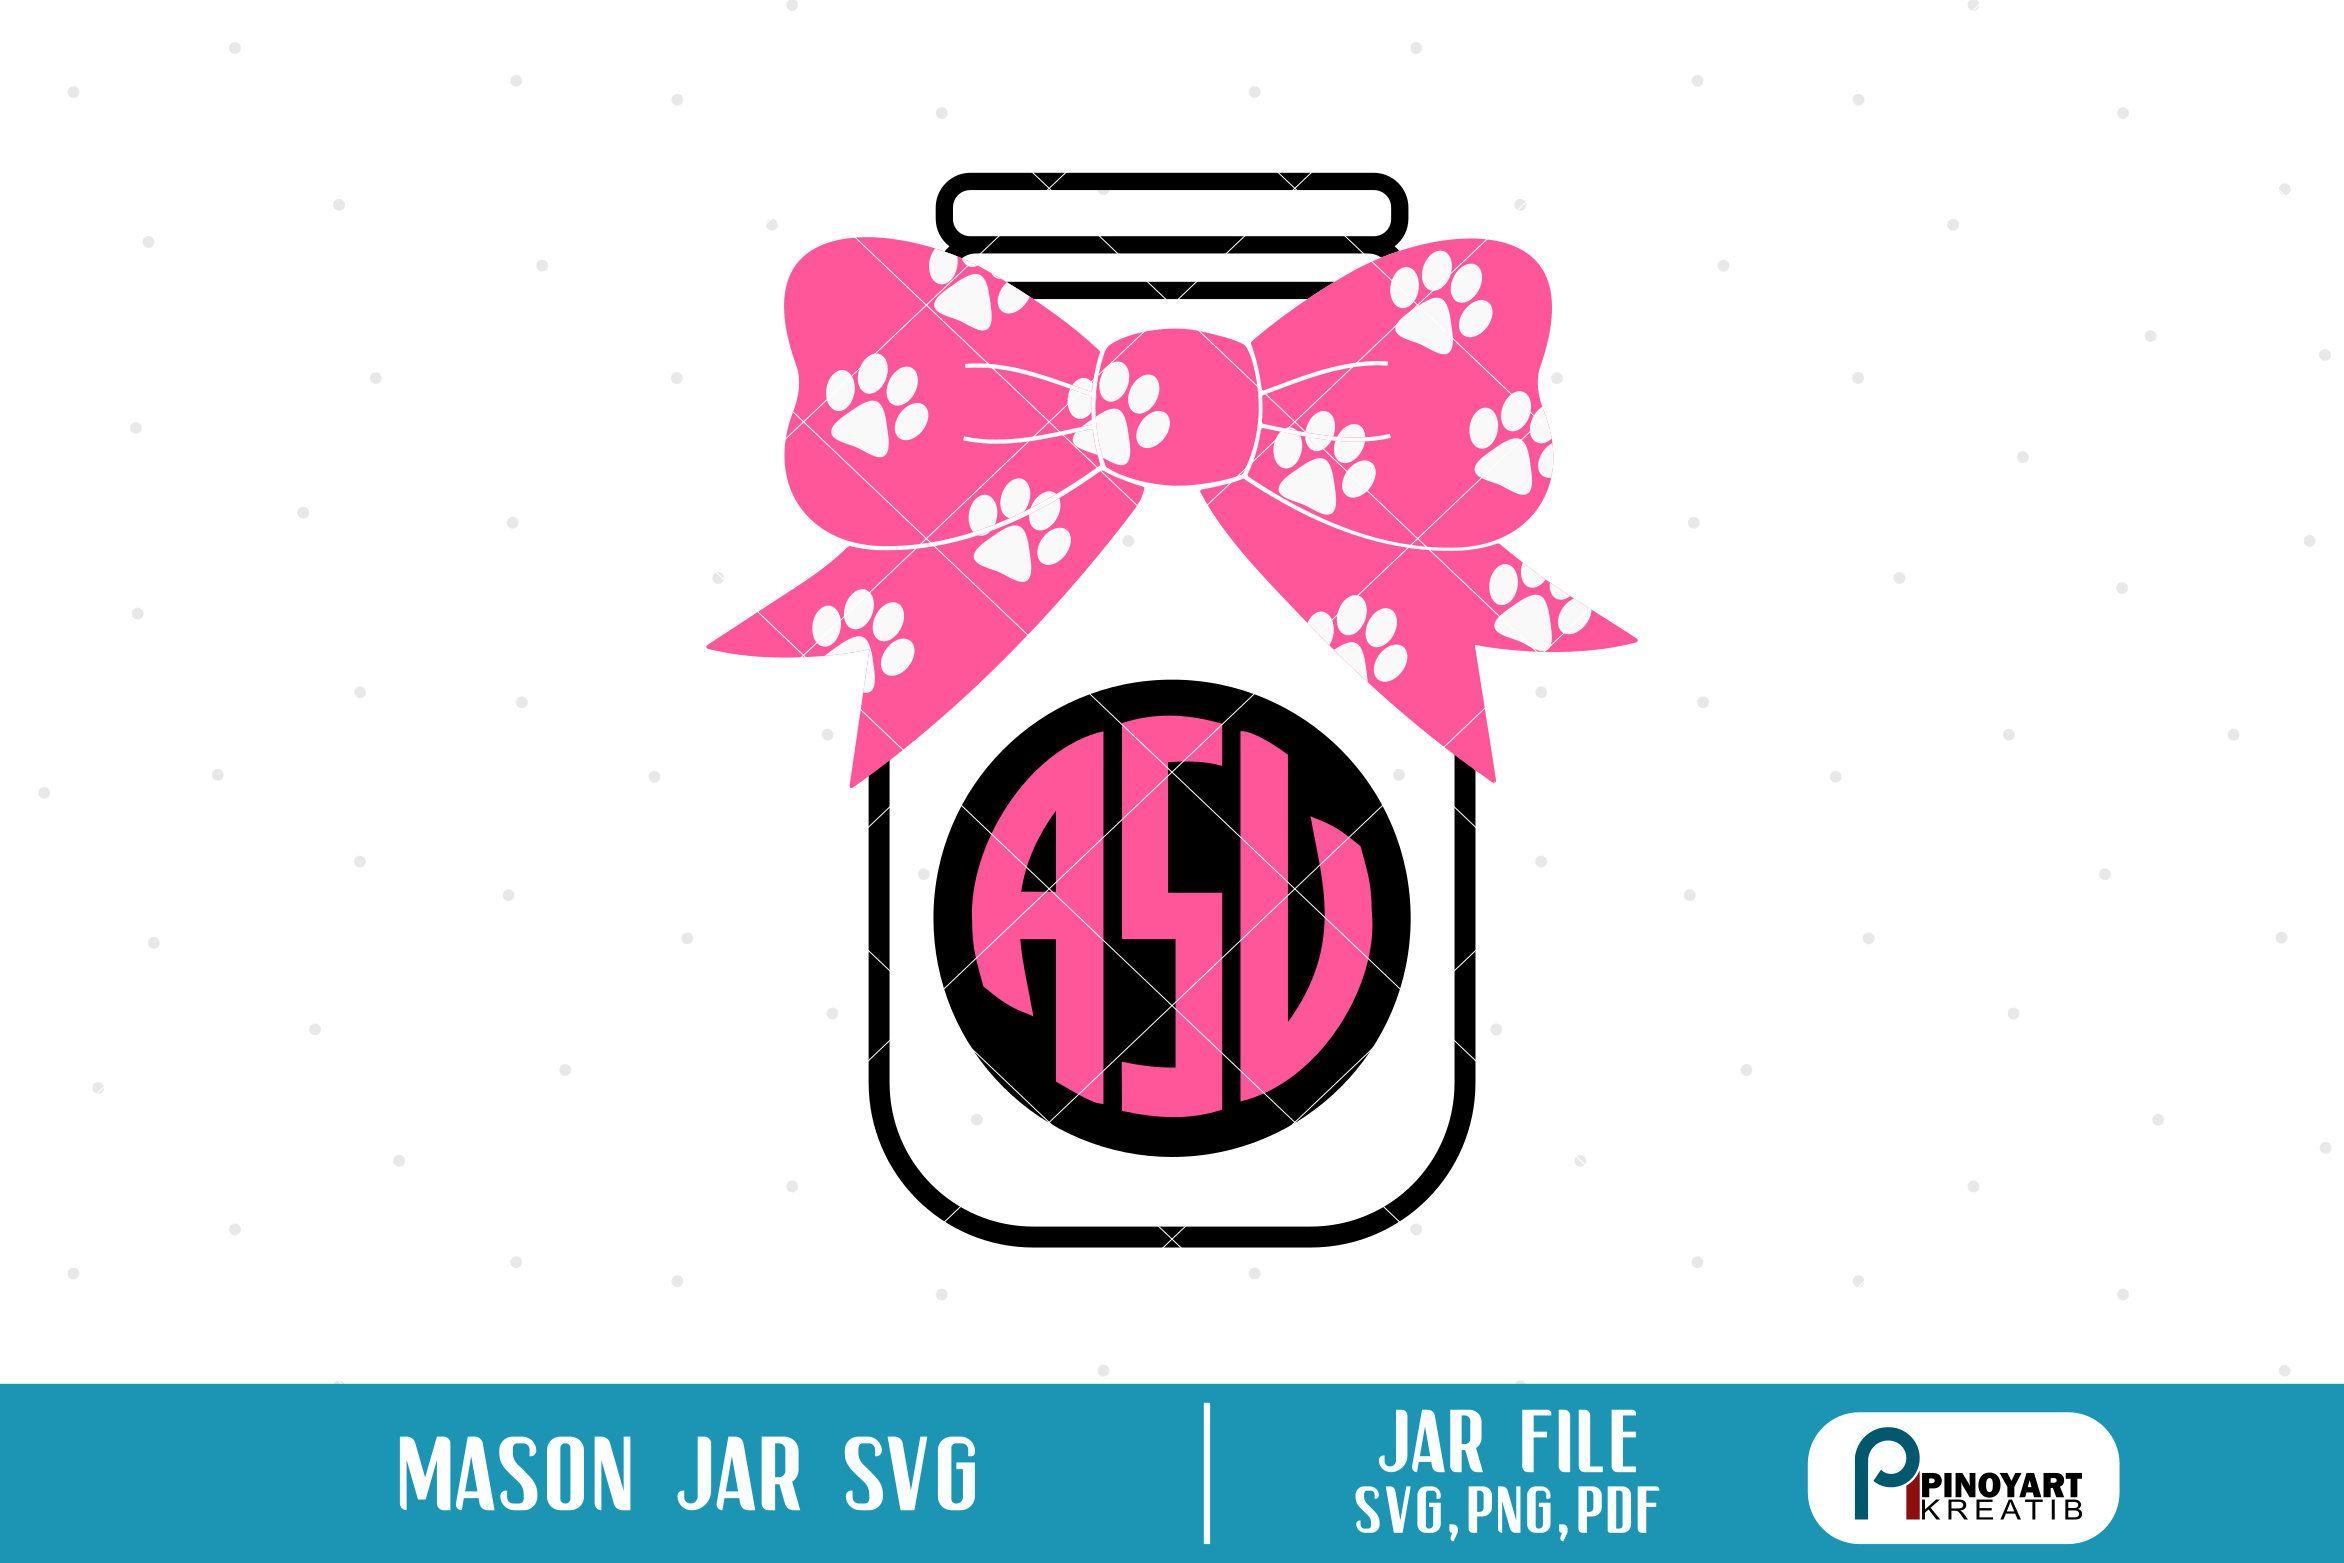 Mason Jar Svg Jar Svg Jar Monogram Svg Paw Svg Jar Clip Art Mason Jar Clip Art Container Svg Mason Jar Graphics Svg Svg Files Mason Jar Clip Art Monogram Svg